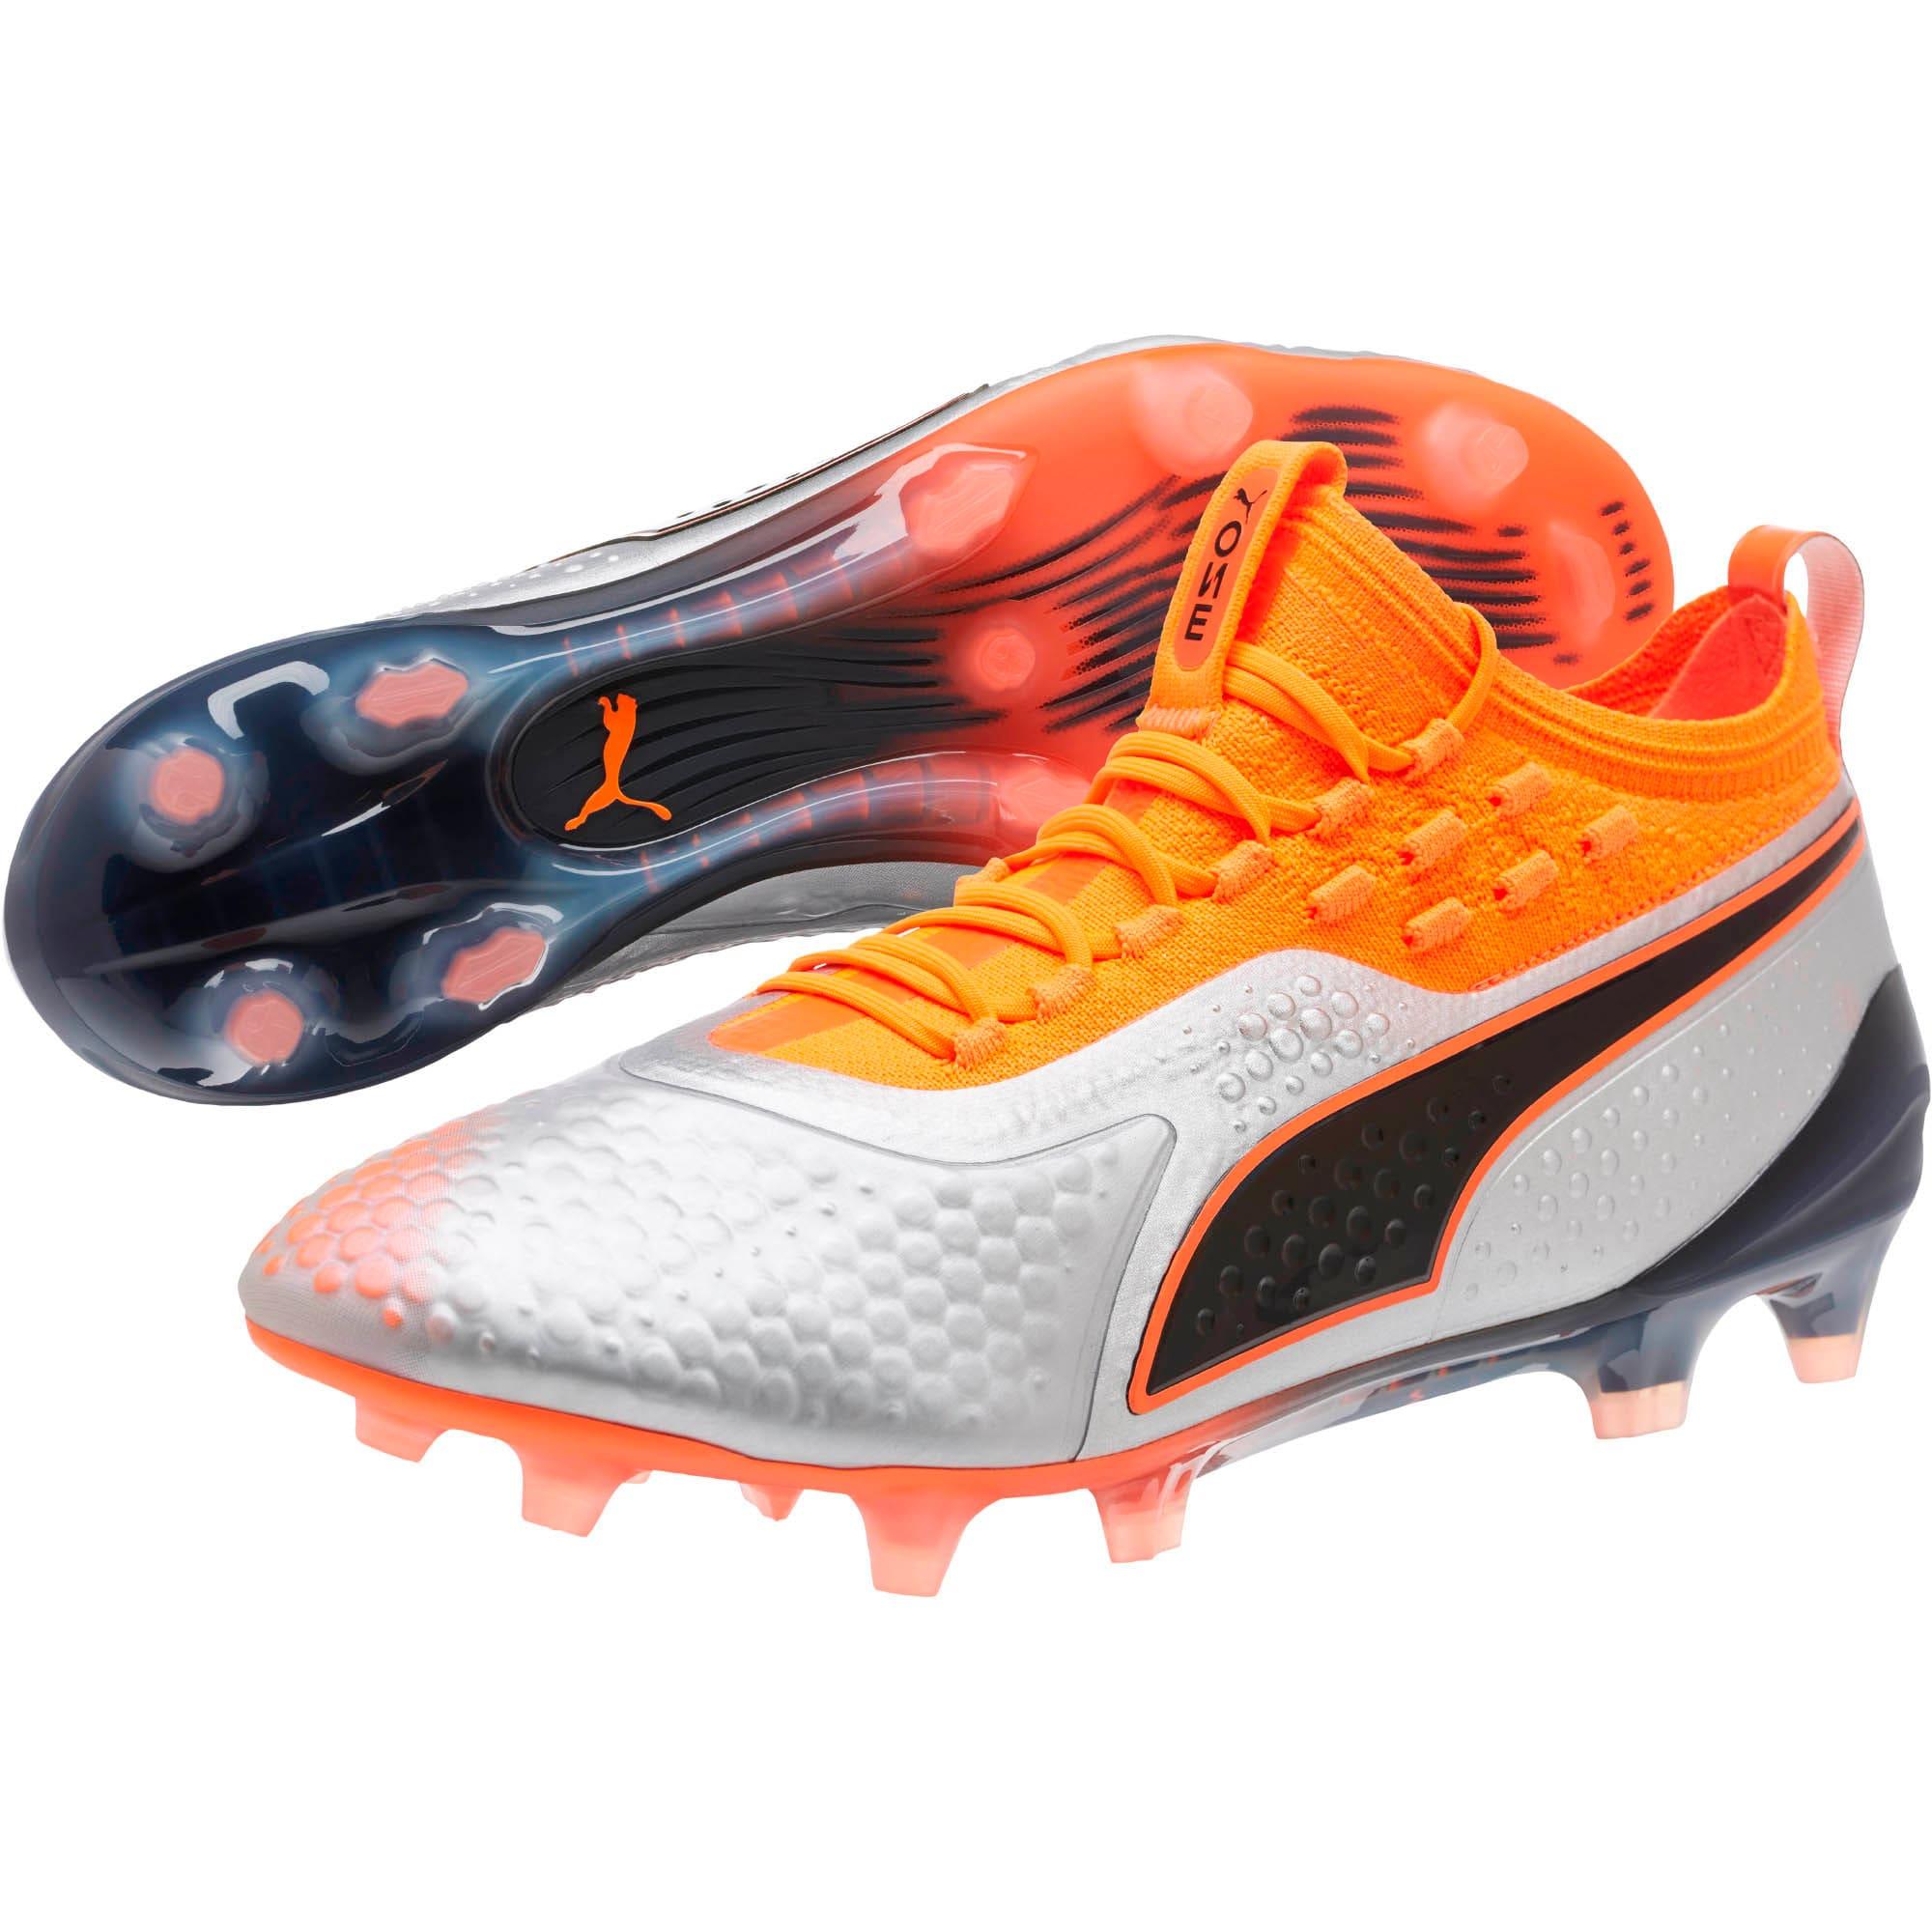 Thumbnail 2 of PUMA ONE 1 FG/AG Men's Soccer Cleats, Silver-Orange-Black, medium